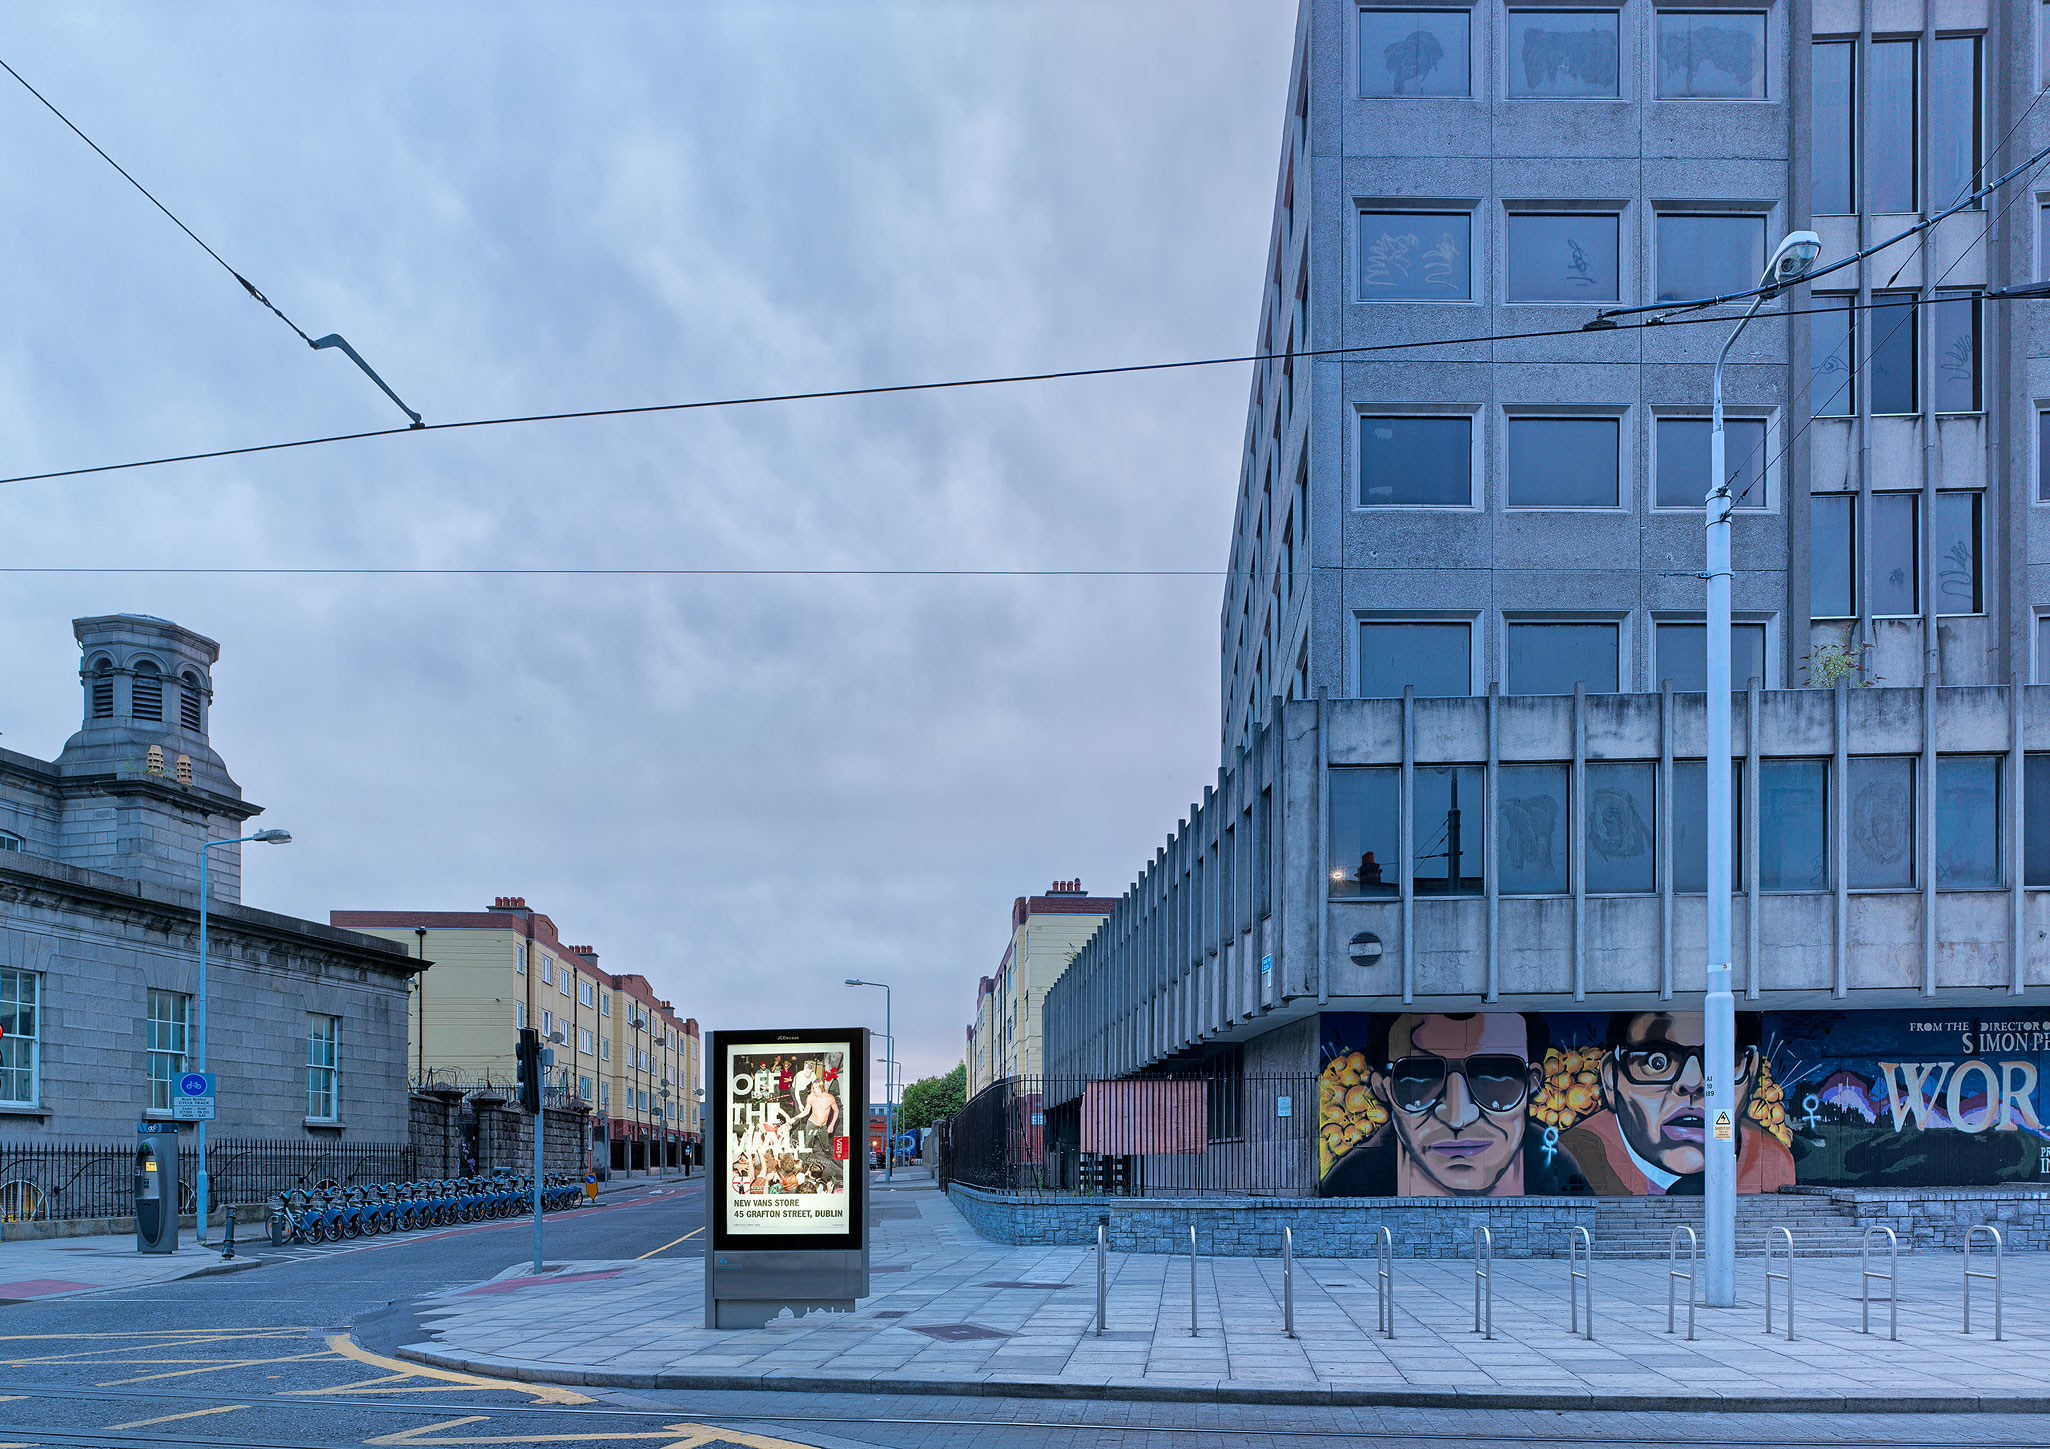 Dublin City Centre motor tax office fine art architectural photography